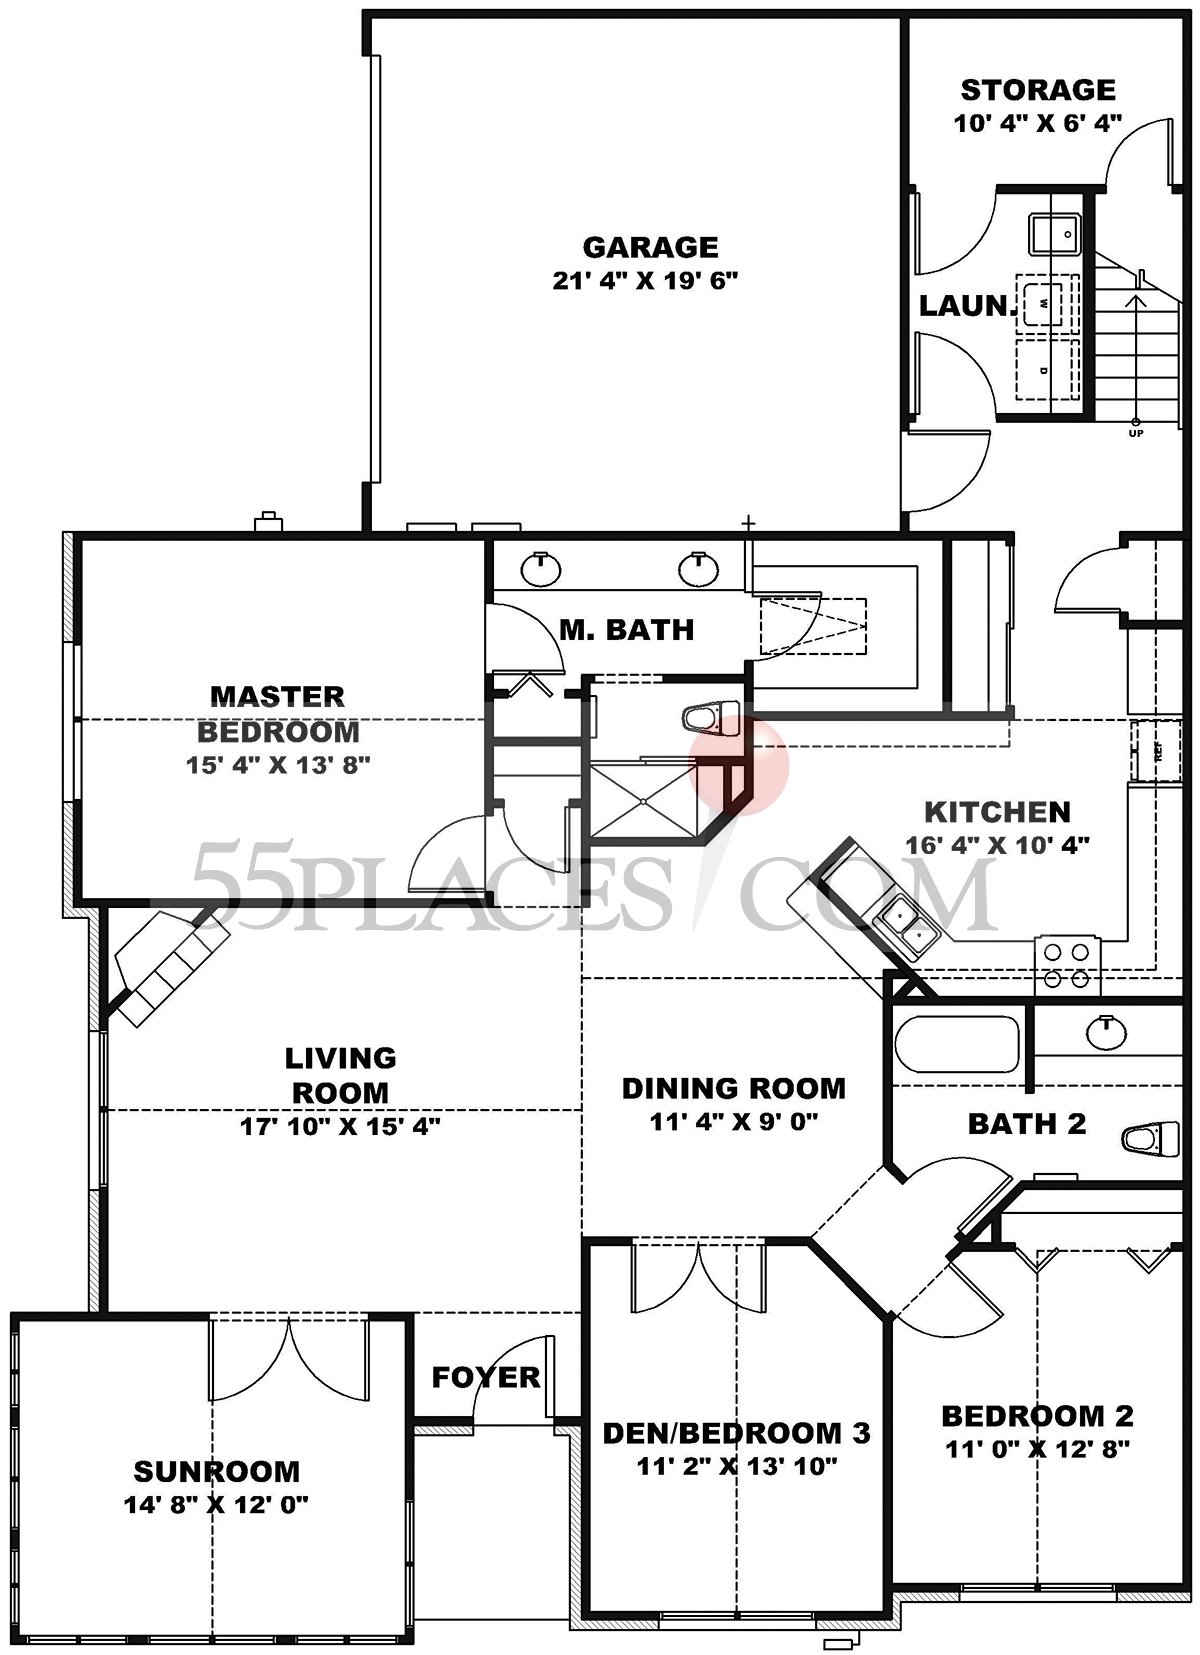 Centebury Ii Floorplan 2270 Sq Ft The Vistas Of Westfield 55places